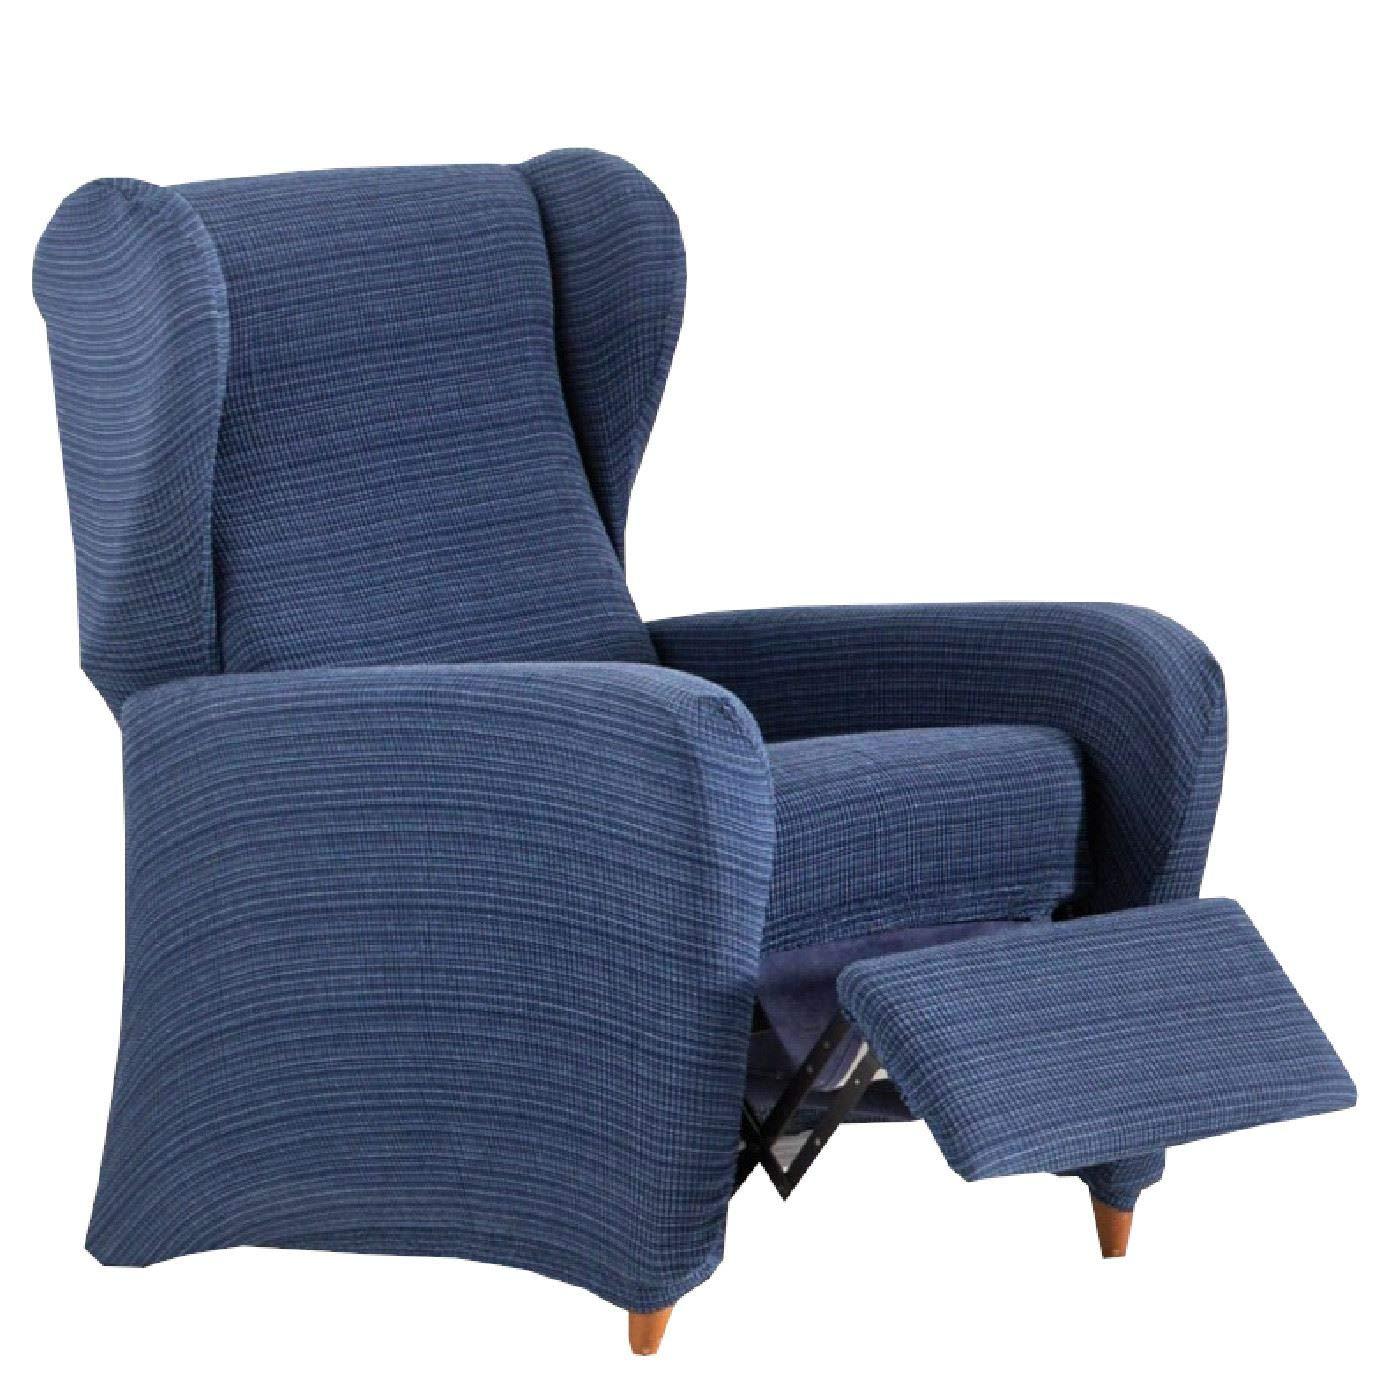 Jarrous Funda de Sillón Relax Elástica Modelo Dionisio, Color Azul-03, Medida 60-75cm de Respaldo